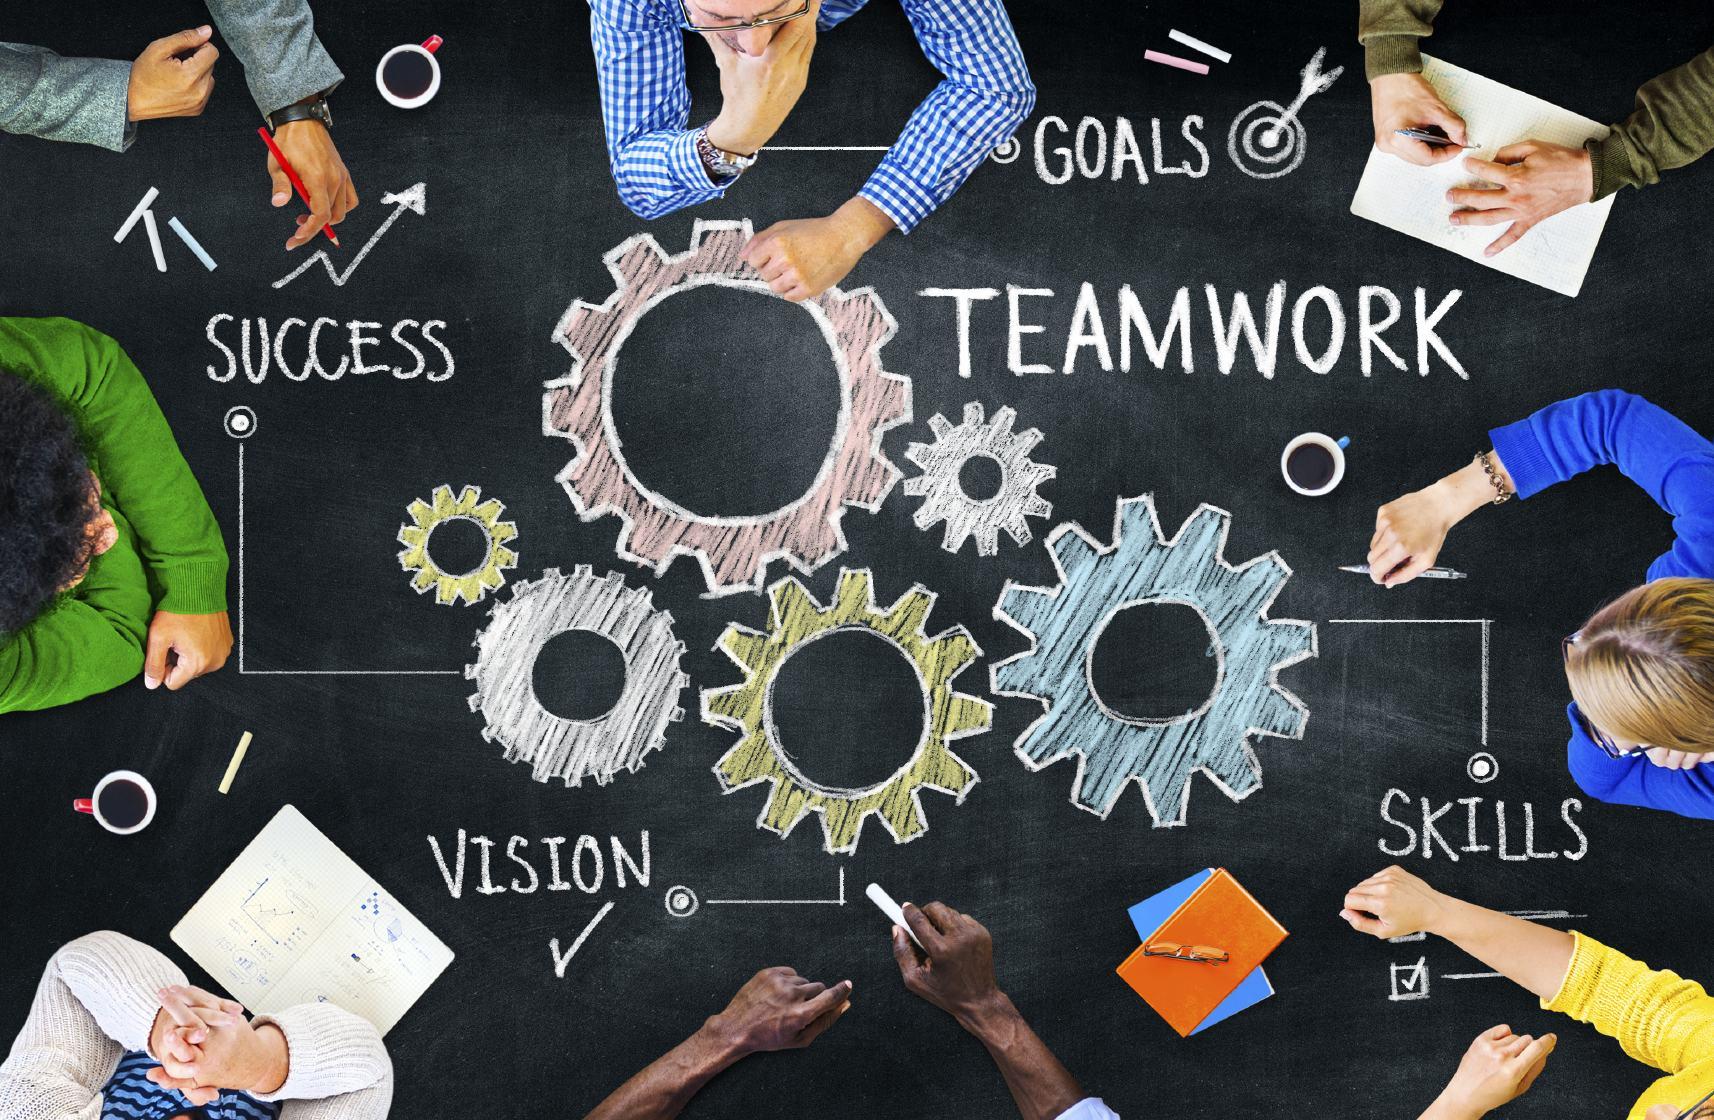 9 bài học quan trọng trong kinh doanh khởi nghiệp - image 569ee459de3d20_Adopt-a-Teamwork-Mindset-1 on https://atpsoftware.com.vn